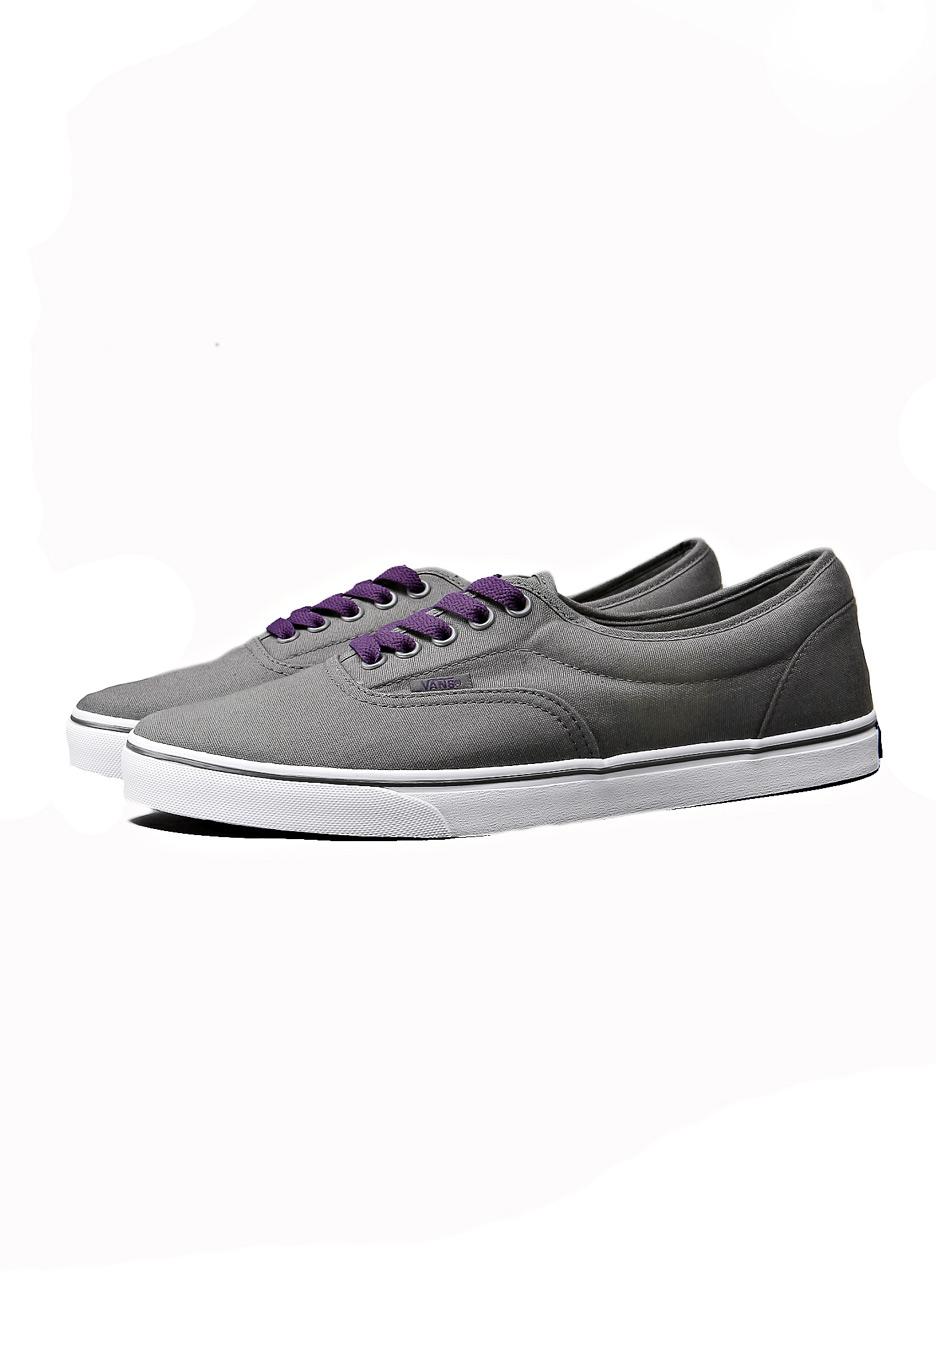 9bd81017b12 Vans - LPE Dark Grey Purple - Buty - Impericon.com PL